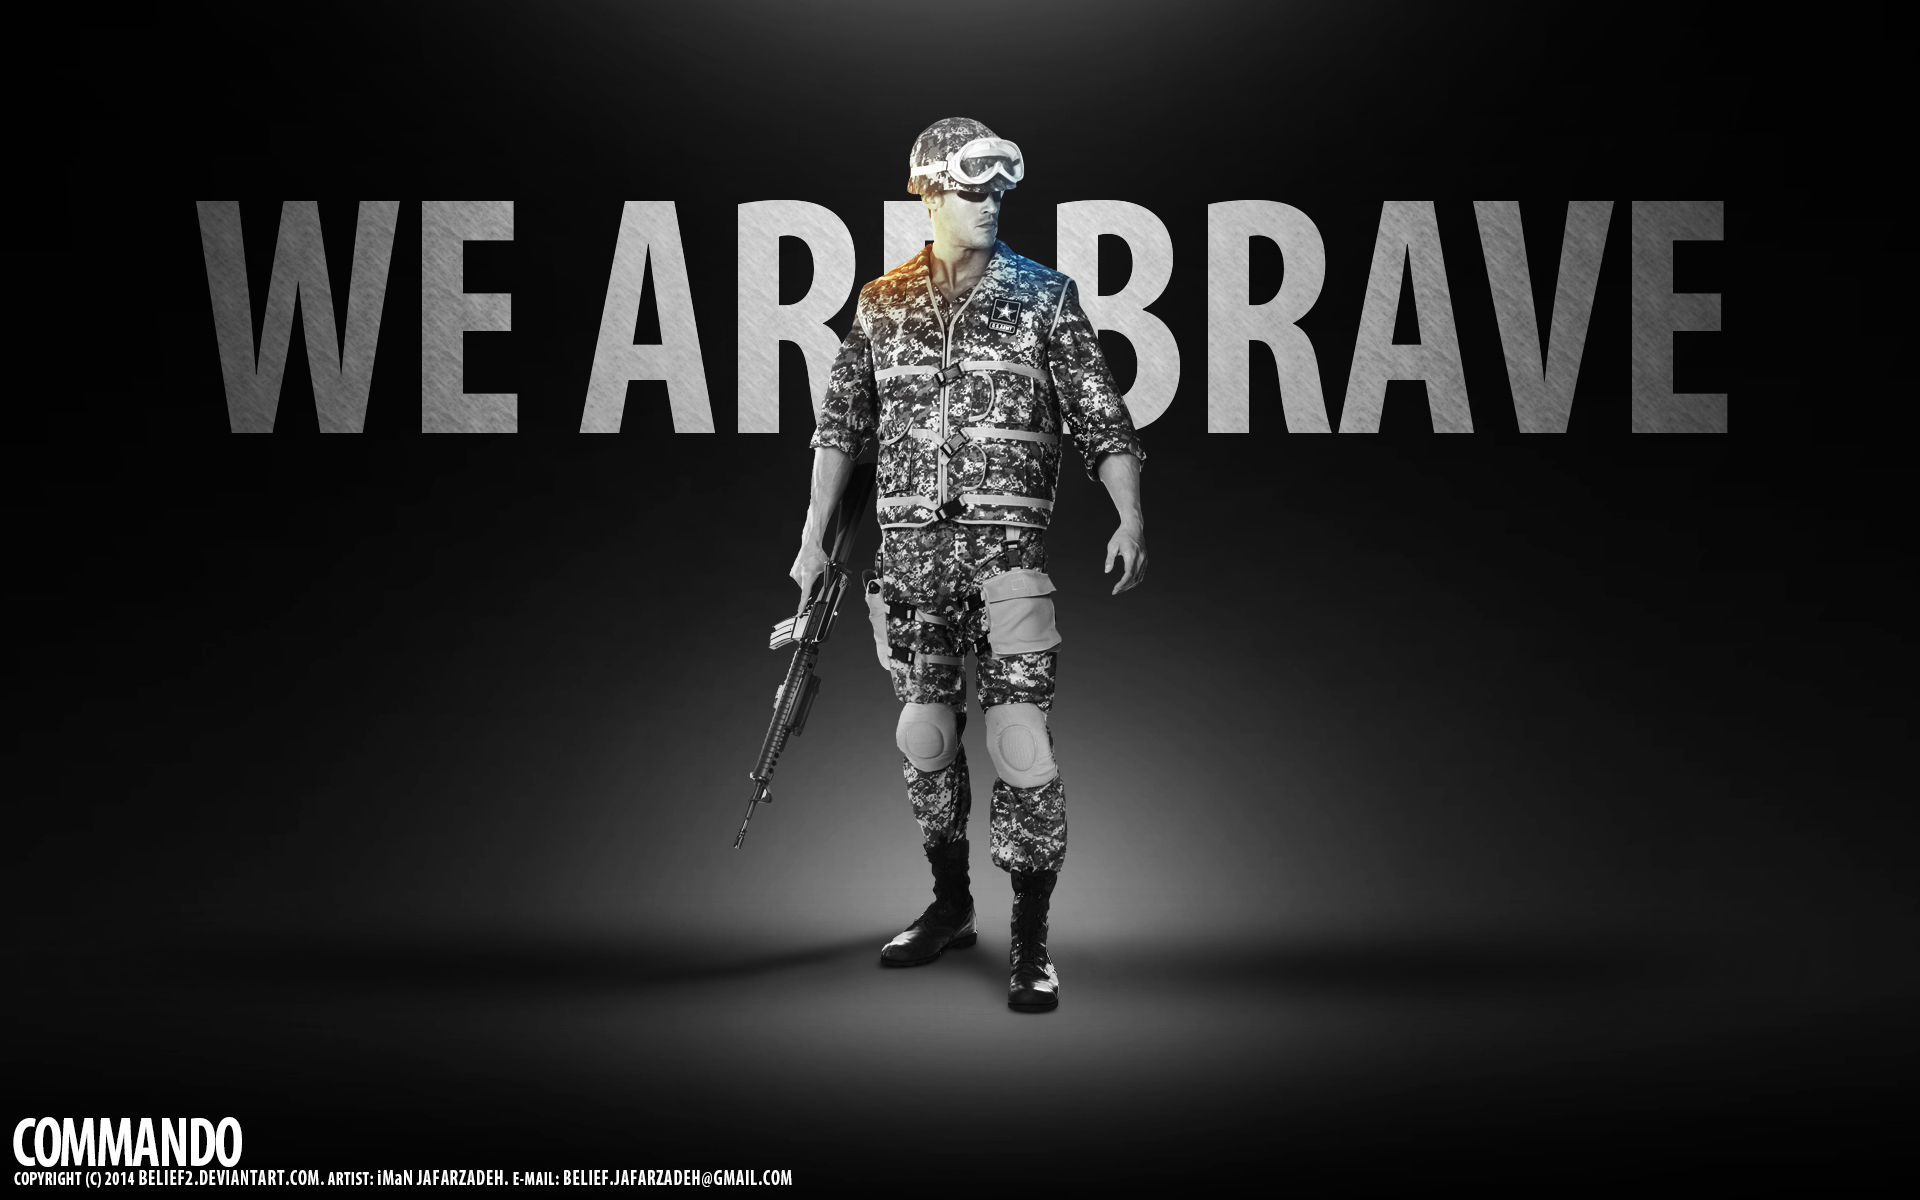 Commando by belief2